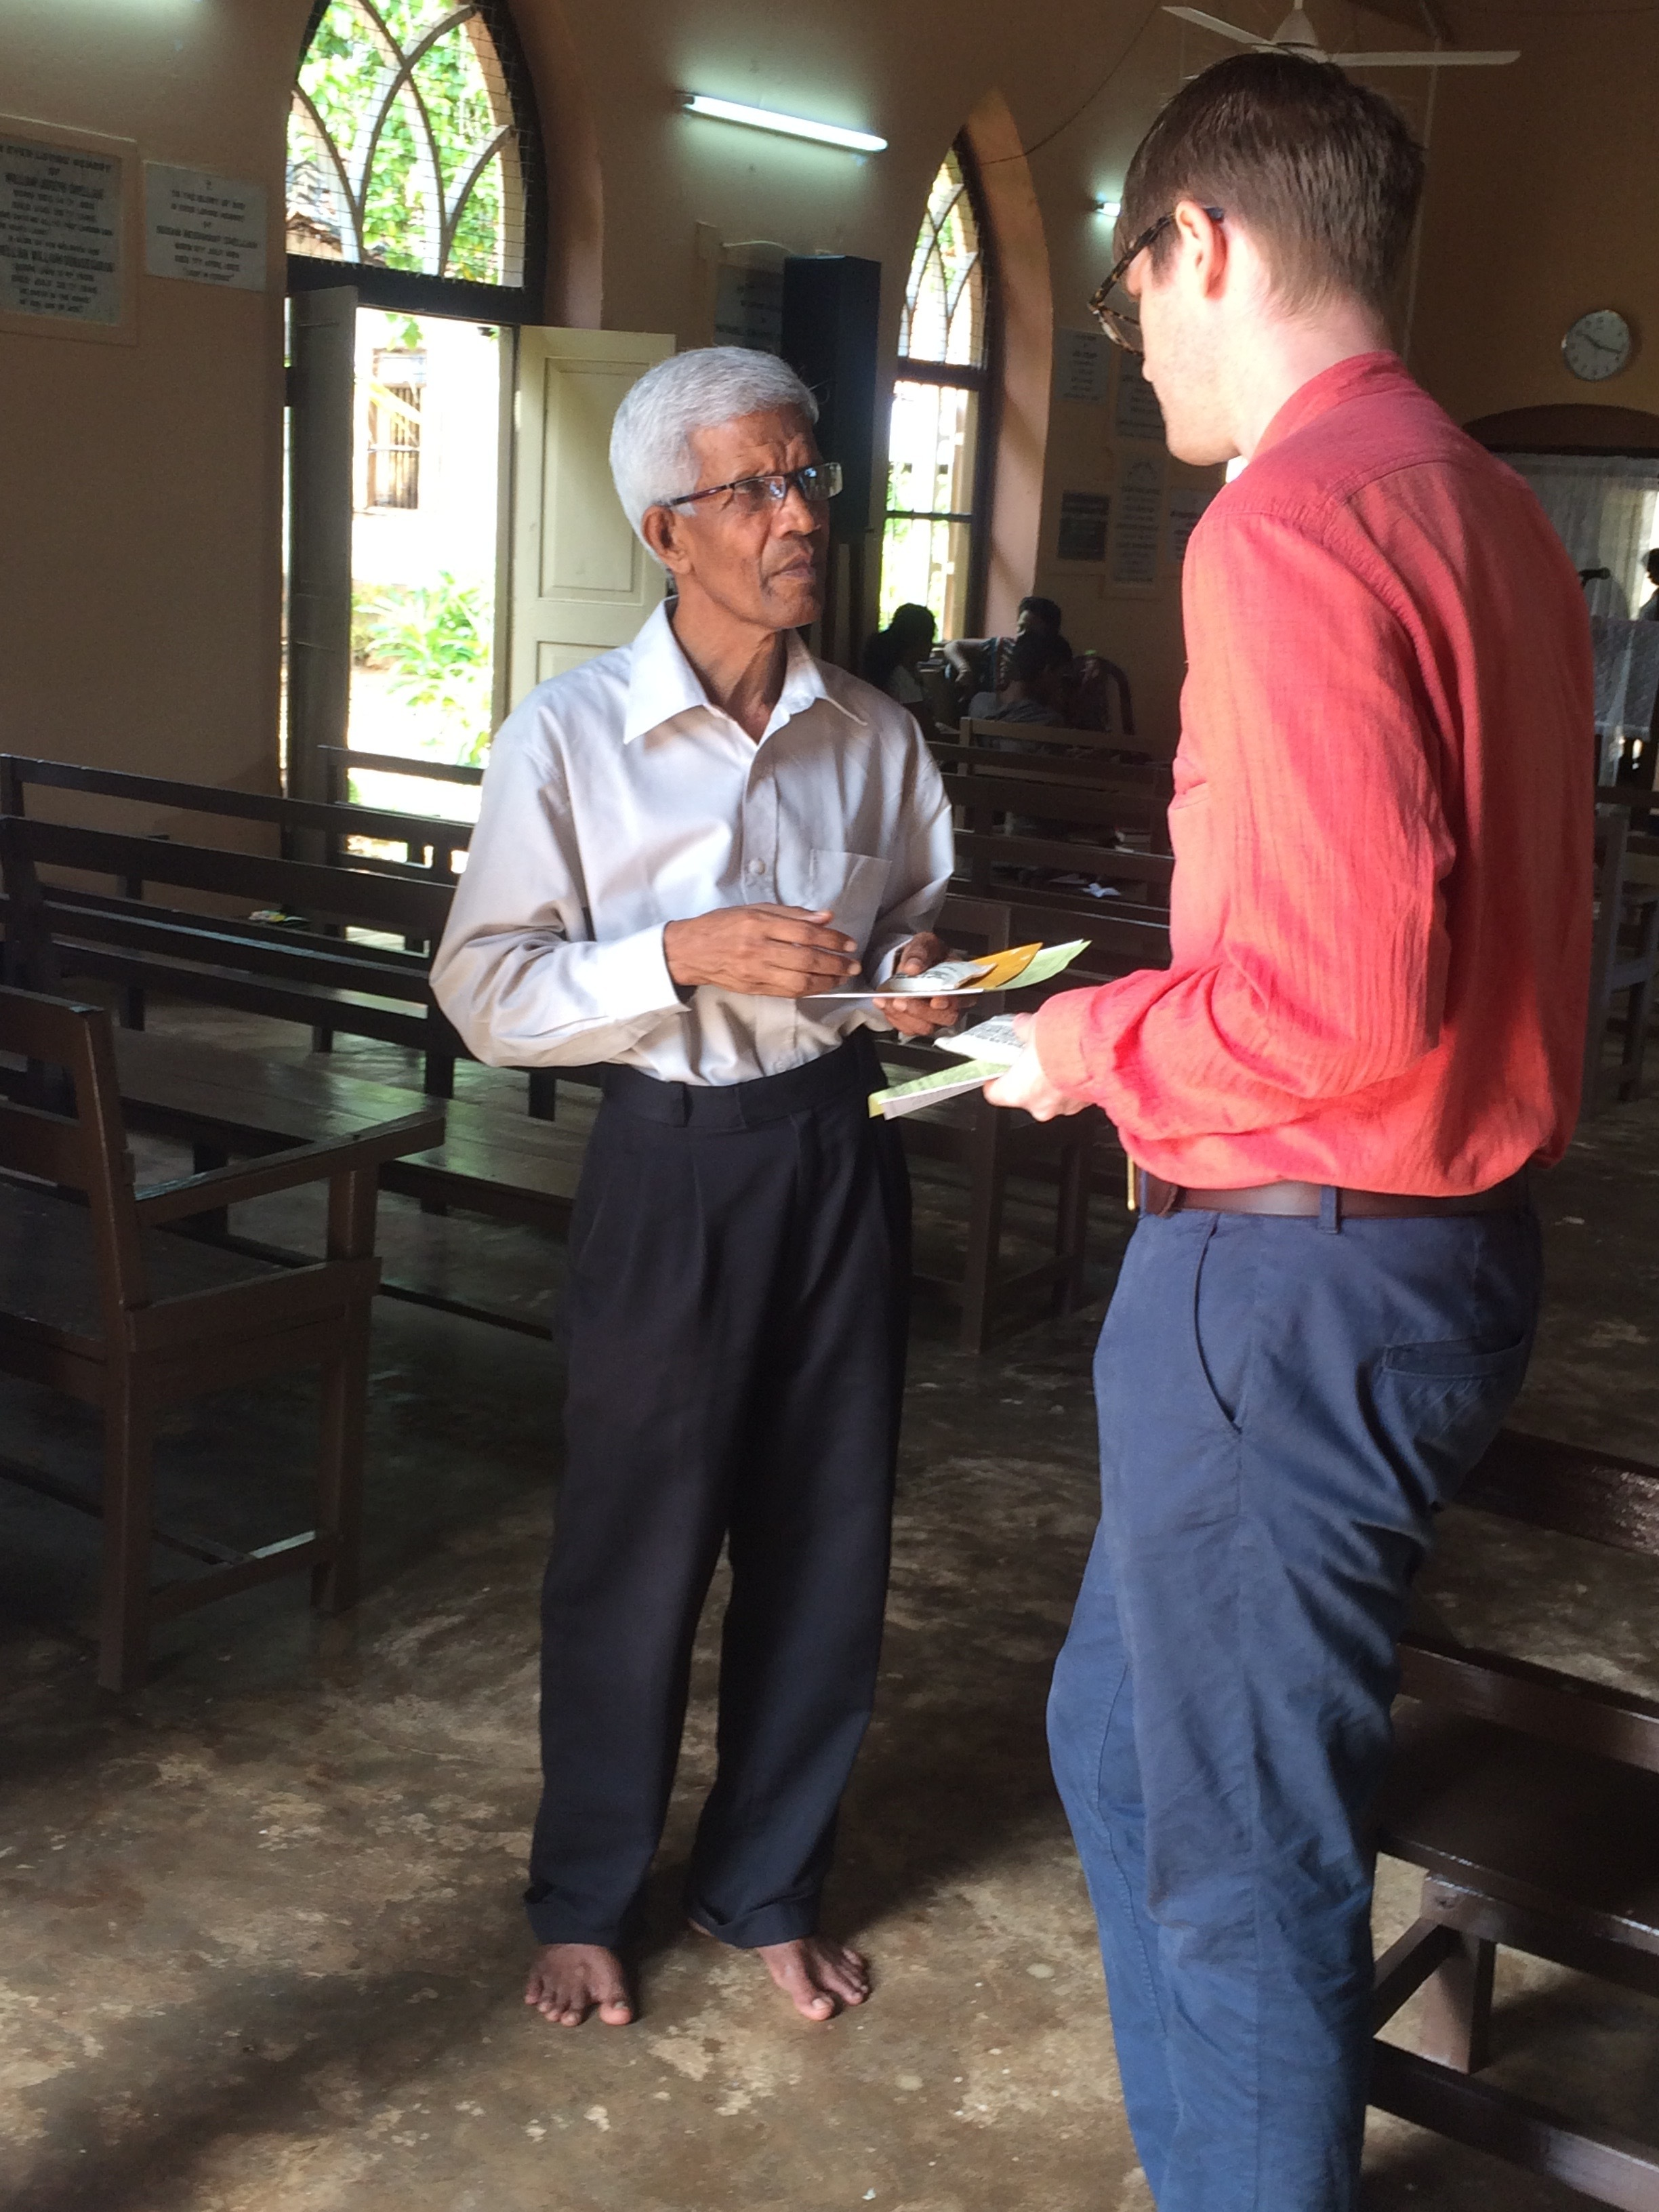 Distributing project information at Tellippalai church. Photo Credit: Henria Aton